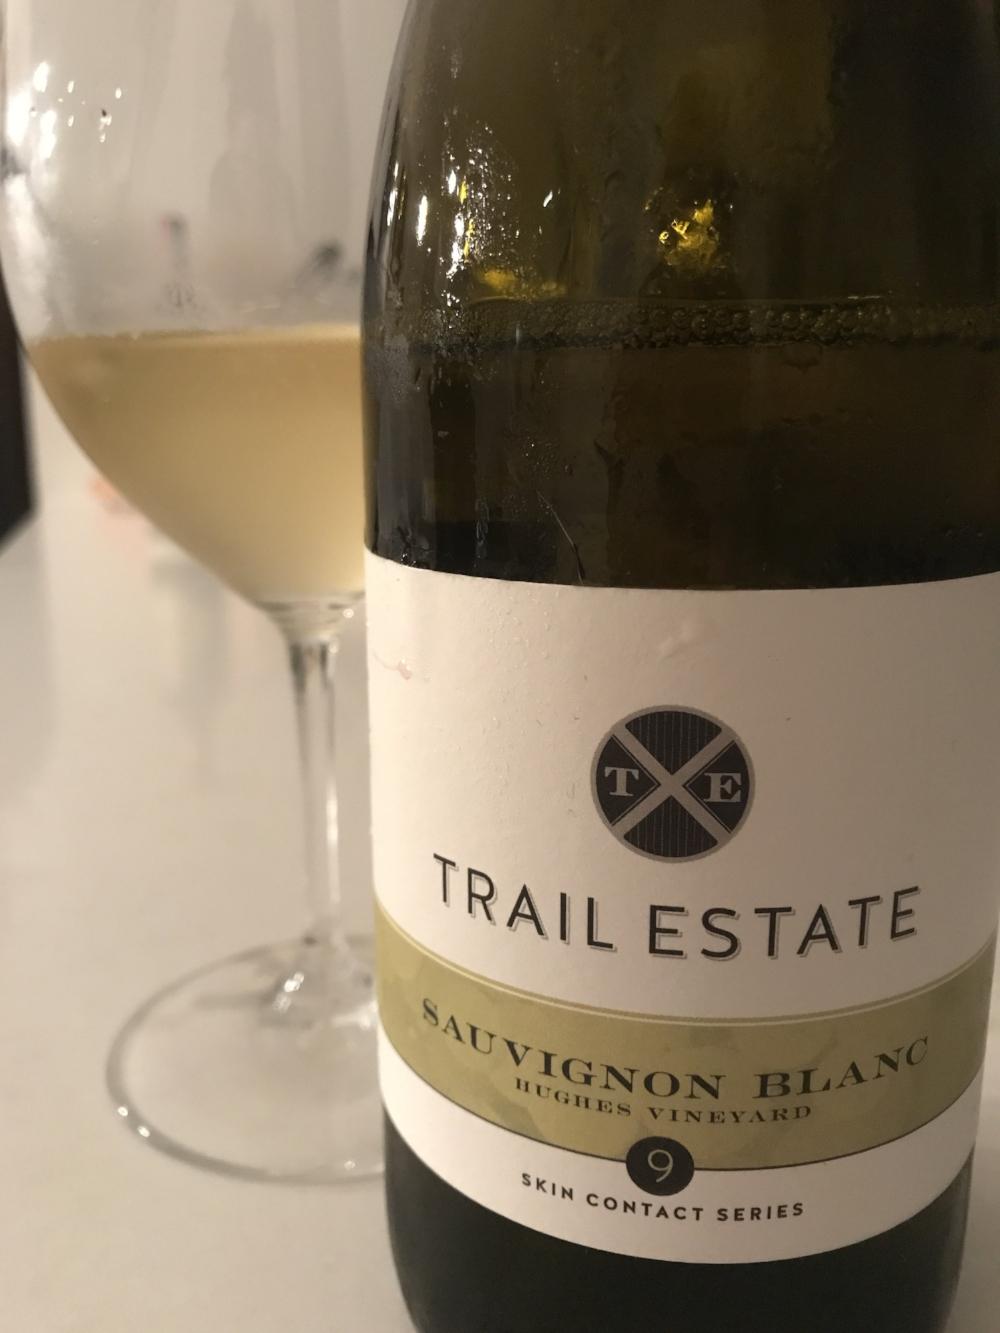 Trail Estates Skin Contact Series Sauvignon Blanc 2016